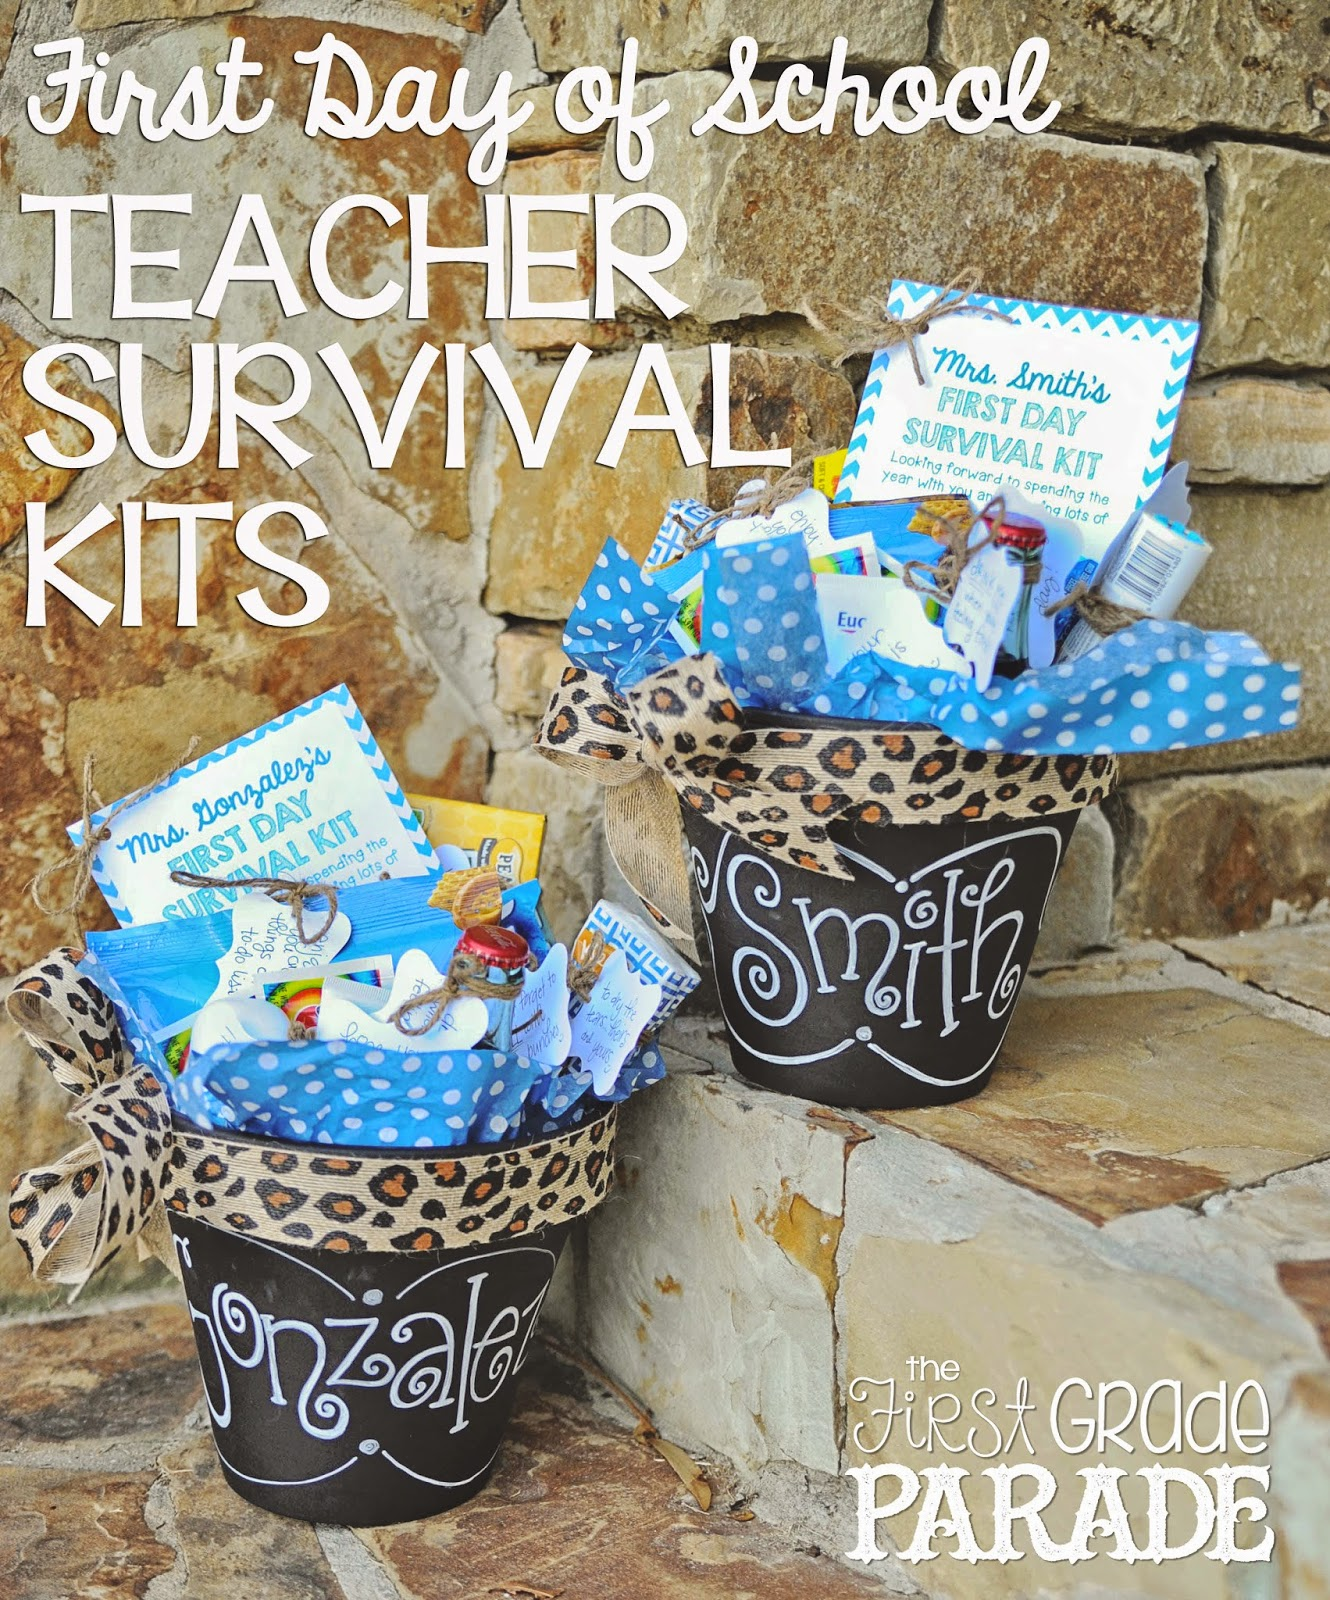 Diy Gift Idea Day Teacher Home Art Decor: 25 Back To School Teacher Gift Ideas